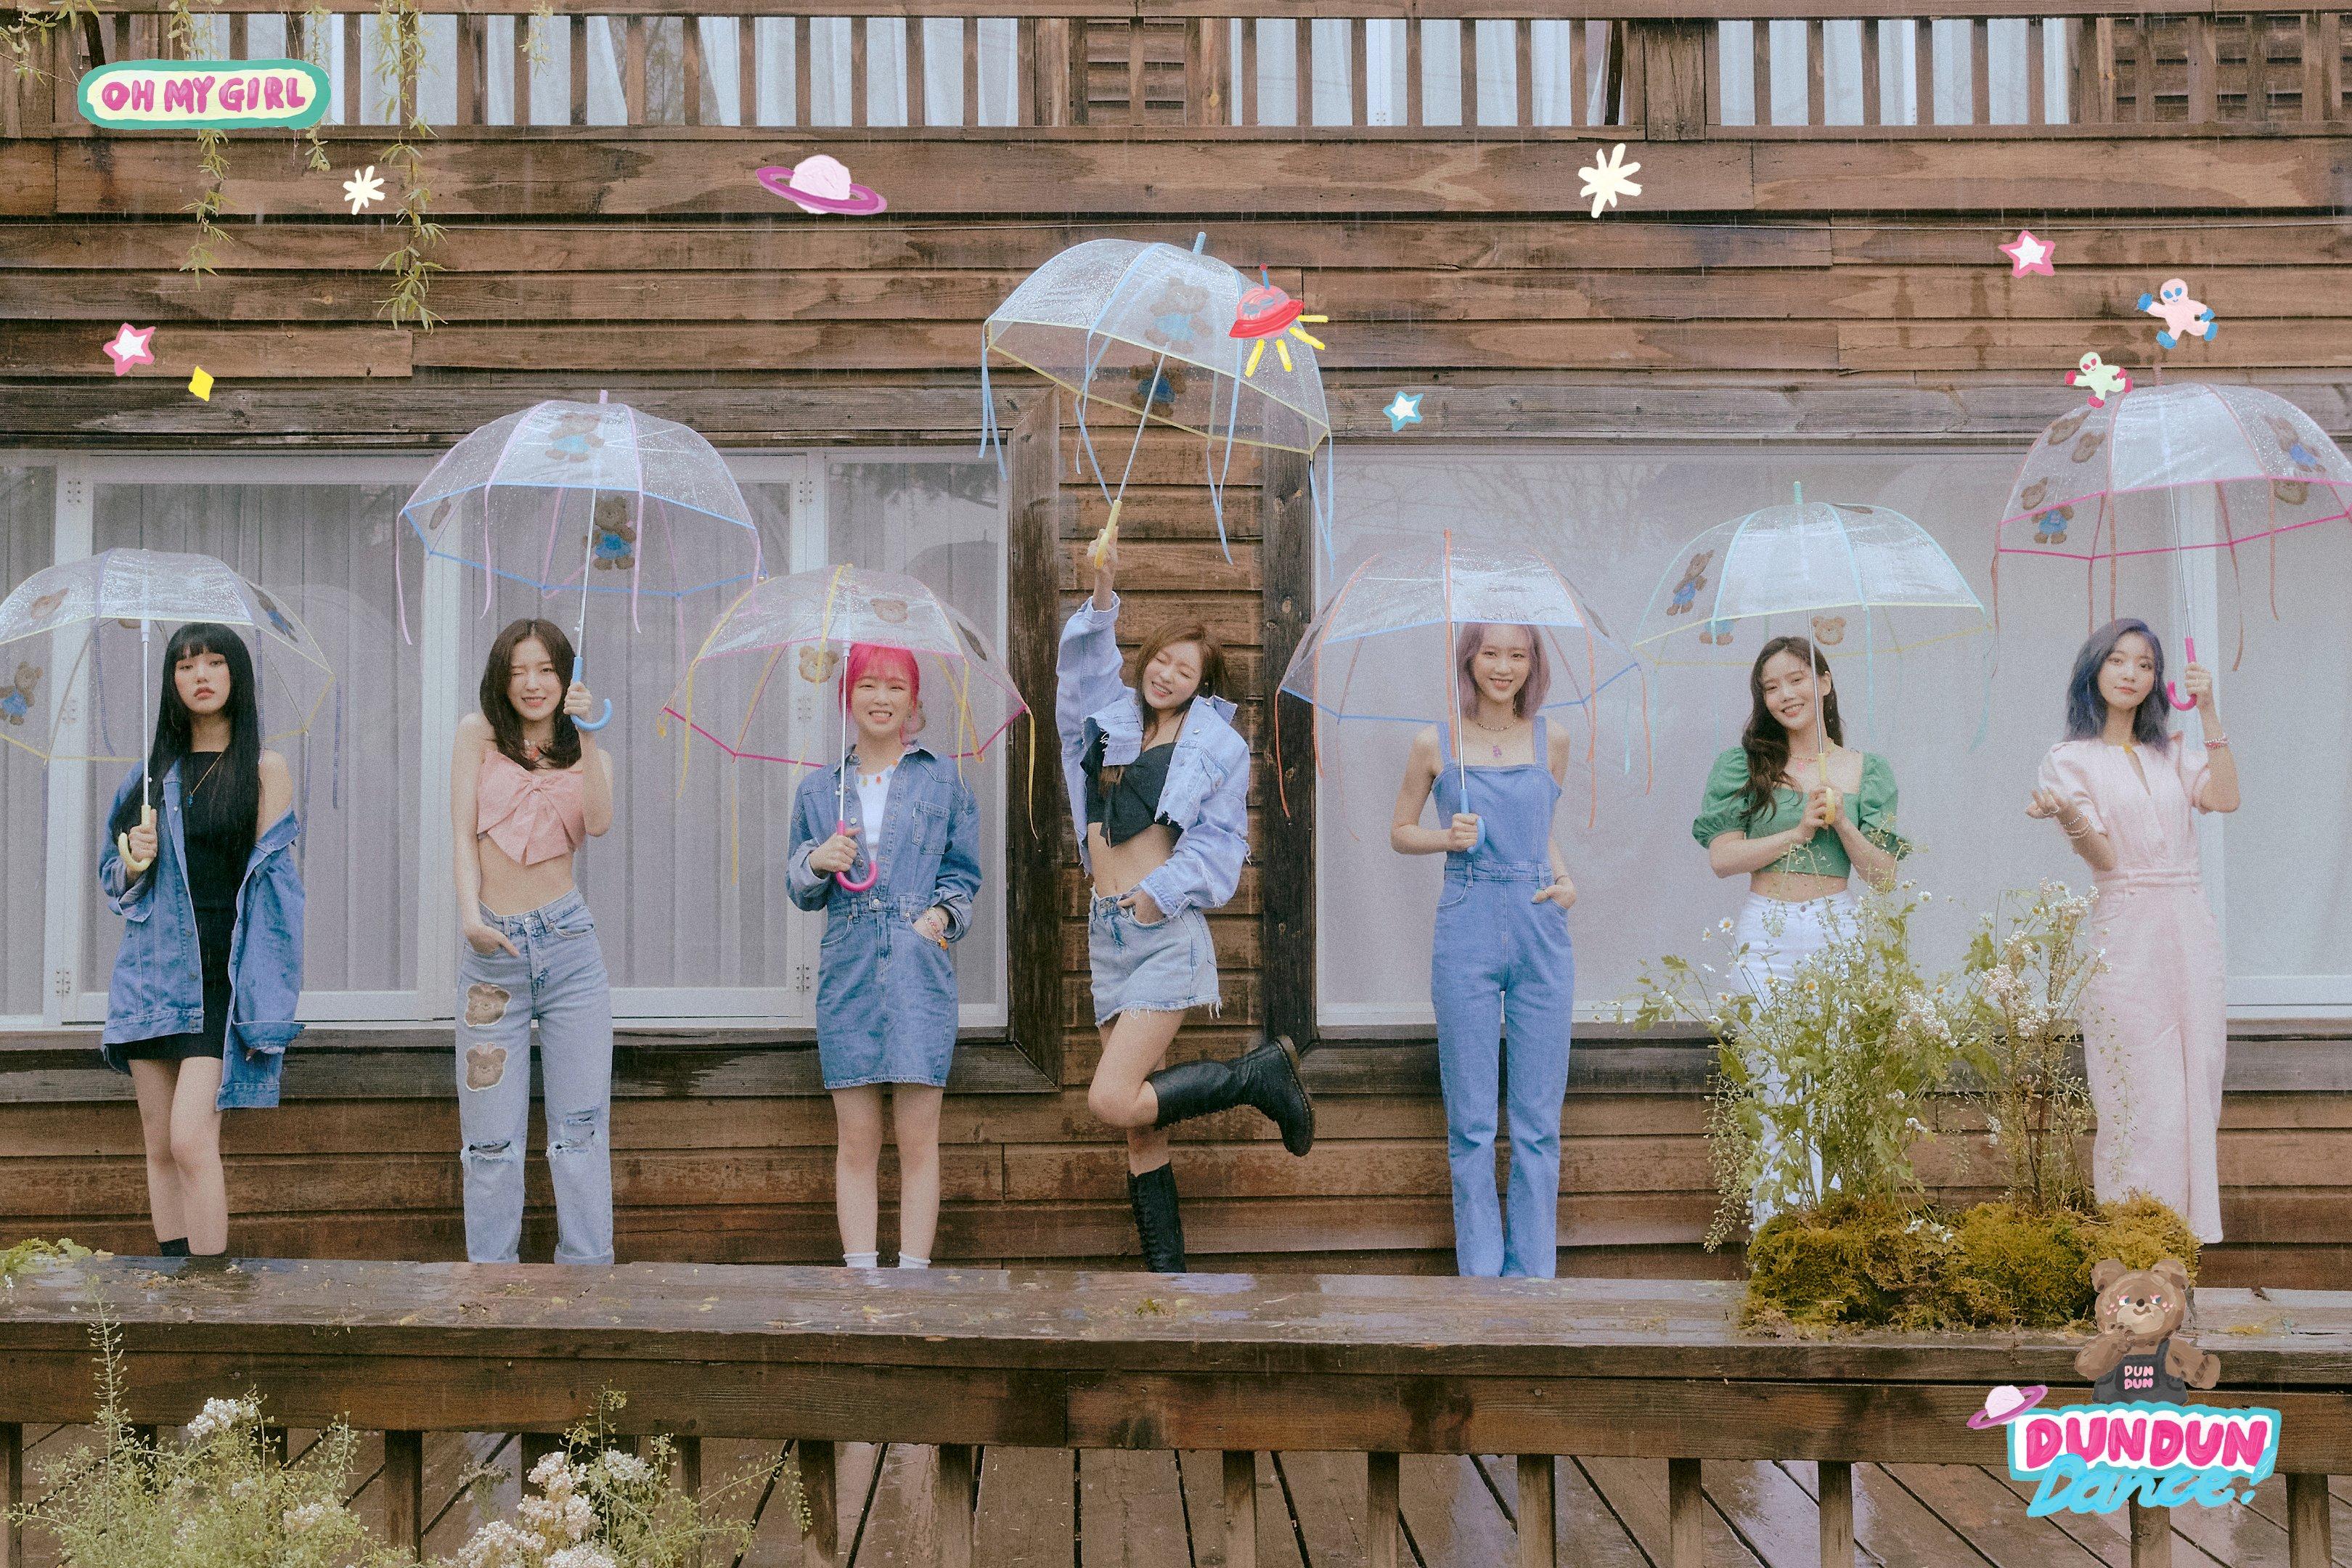 OH MY GIRL - Dear OHMYGIRL Dun Dun Teaser Photos (HD/HQ) - K-Pop Database /  dbkpop.com